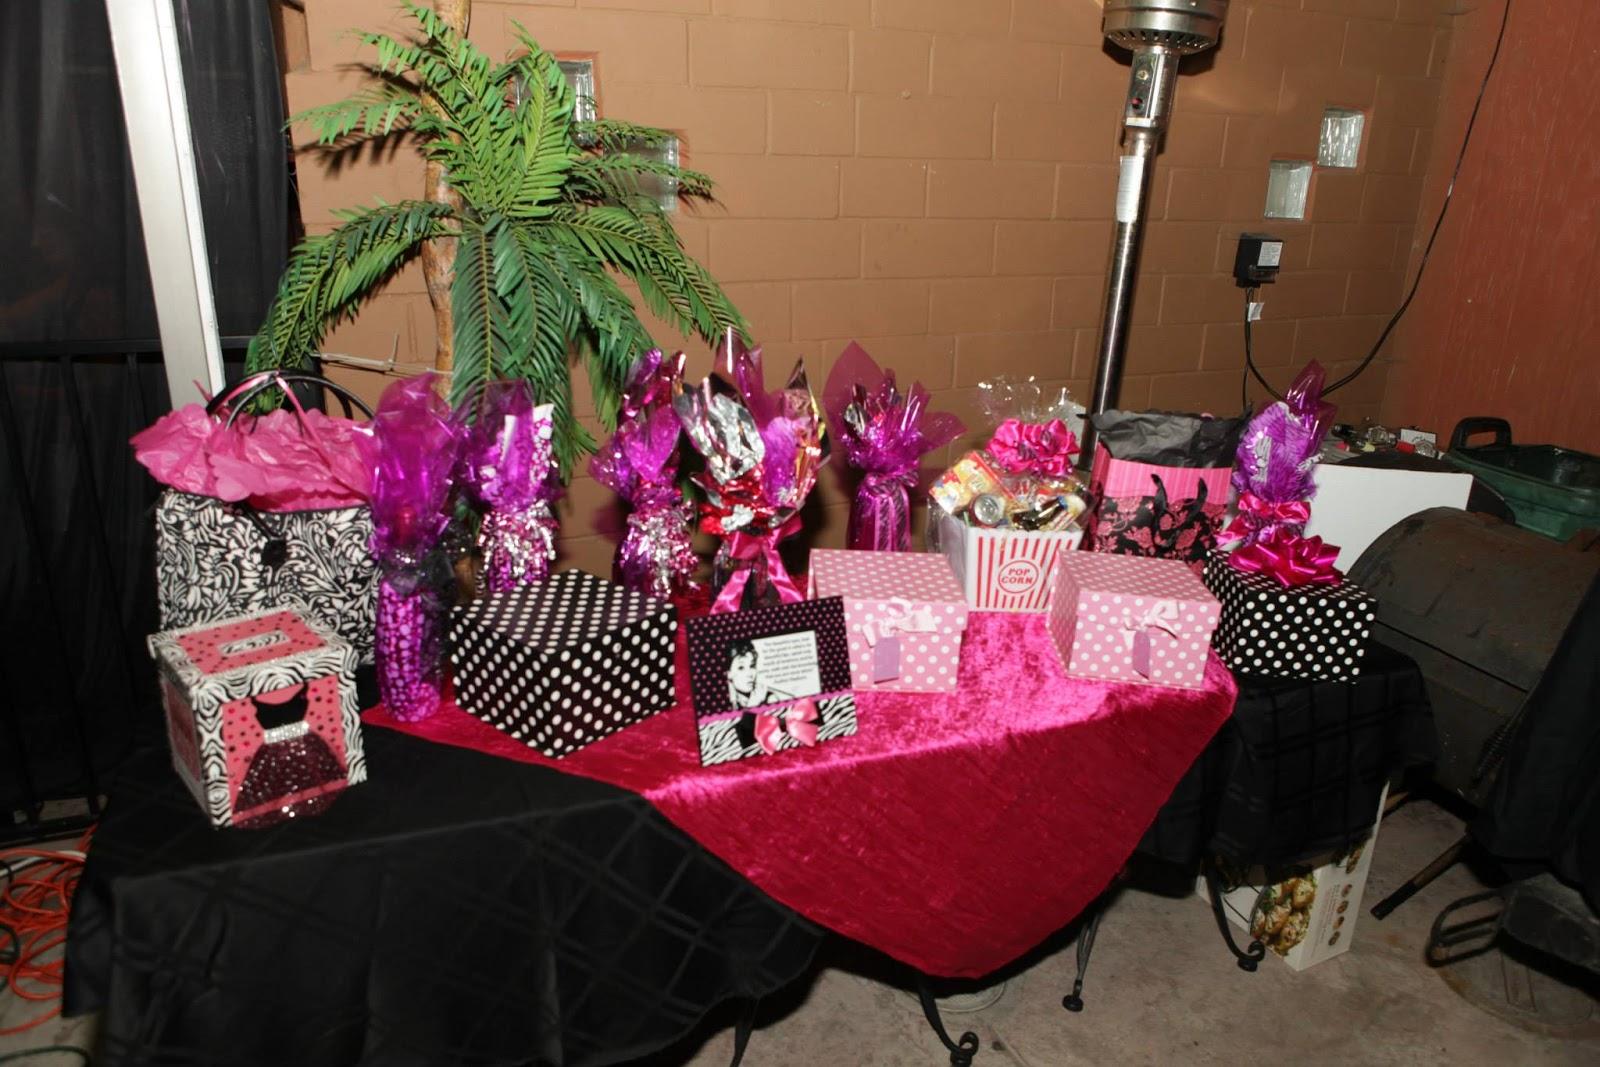 Little black dress club july 2013 for Paparazzi jewelry gift basket